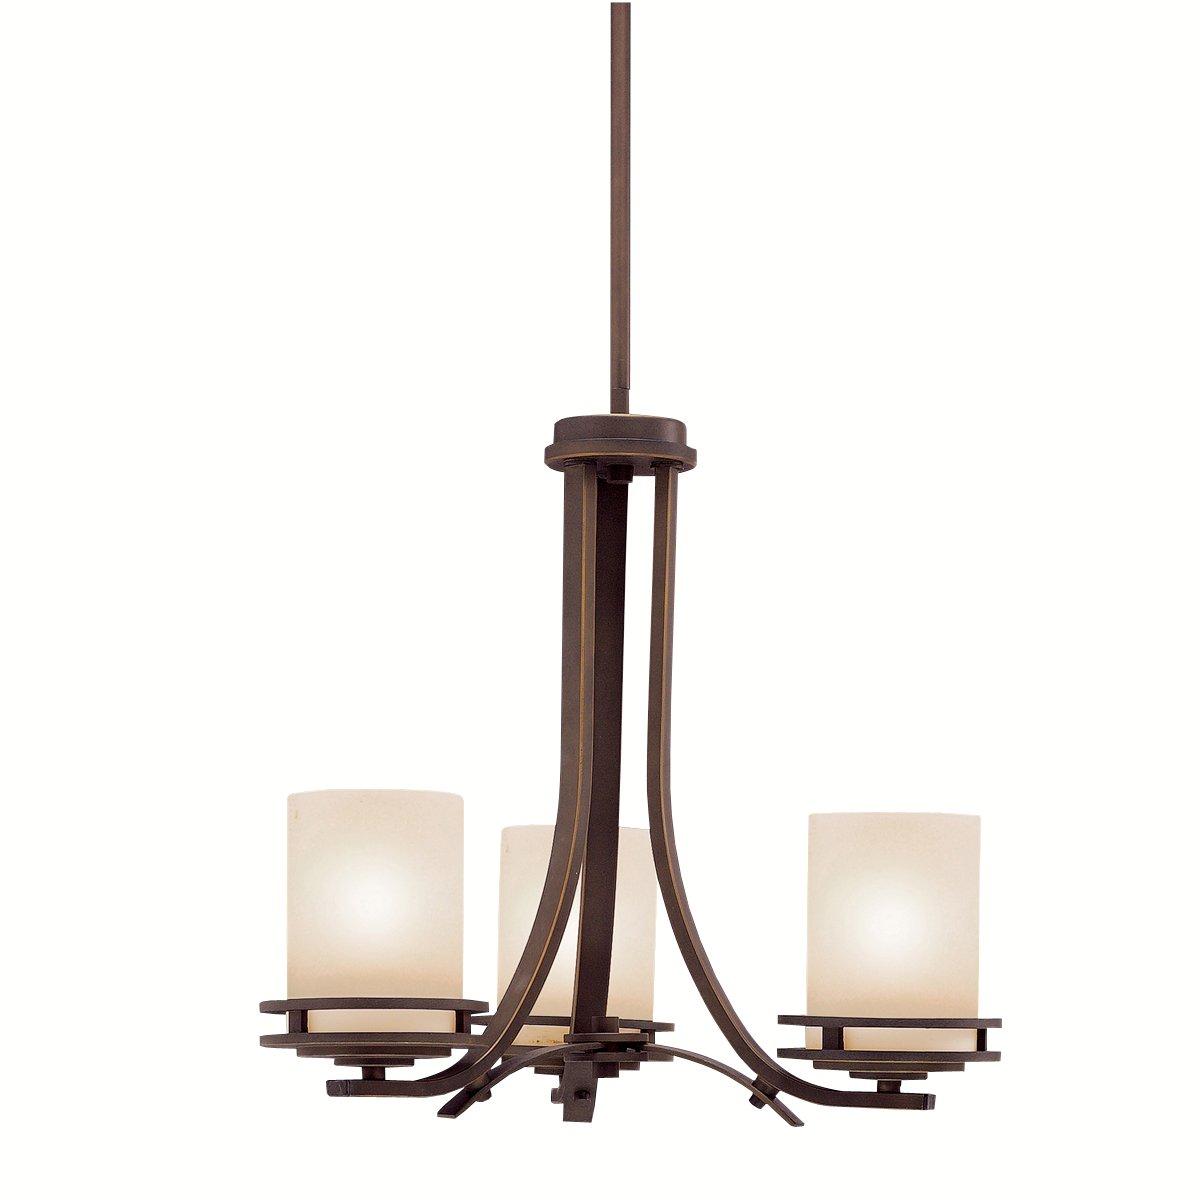 Kichler 1671oz three light chandelier chandeliers amazon arubaitofo Images